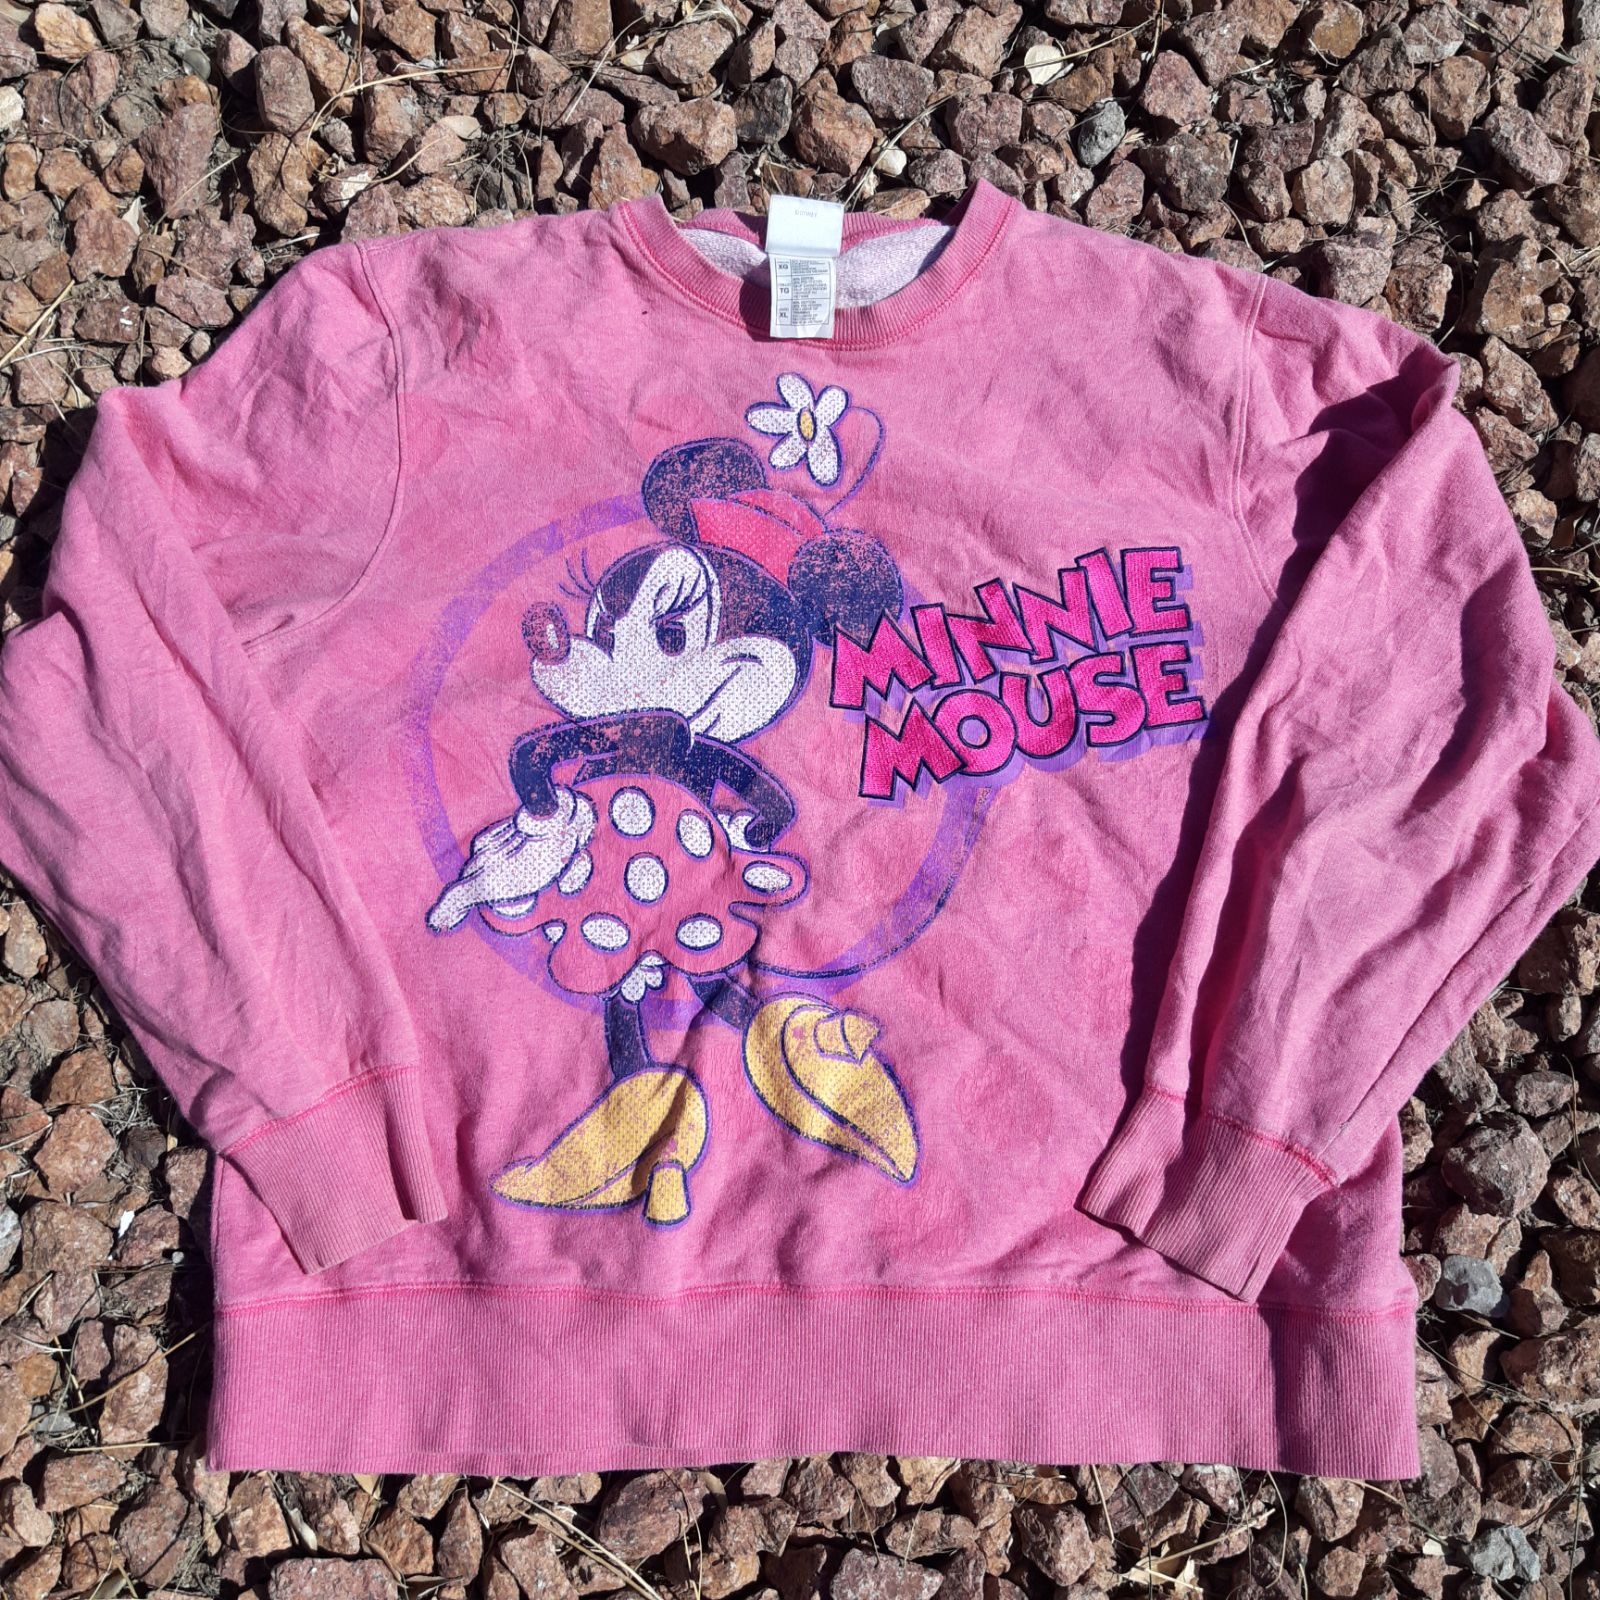 VTG Disney Minnie Mouse Sweatshirt